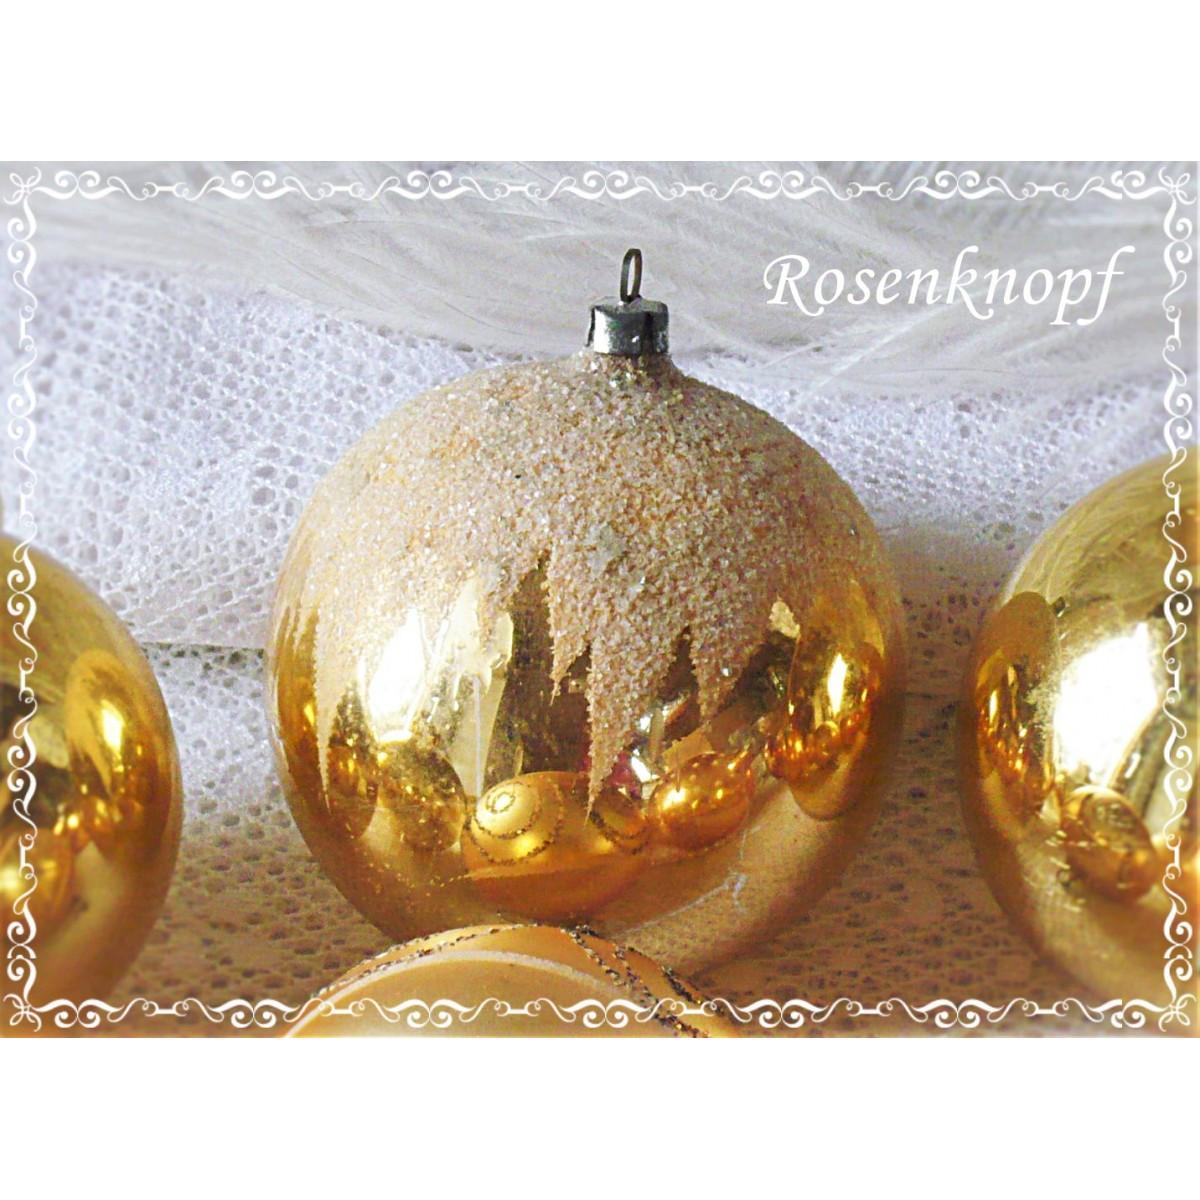 Christbaumkugeln Weiß Gold.9 Christbaumkugeln Gold Charlott Amsberg